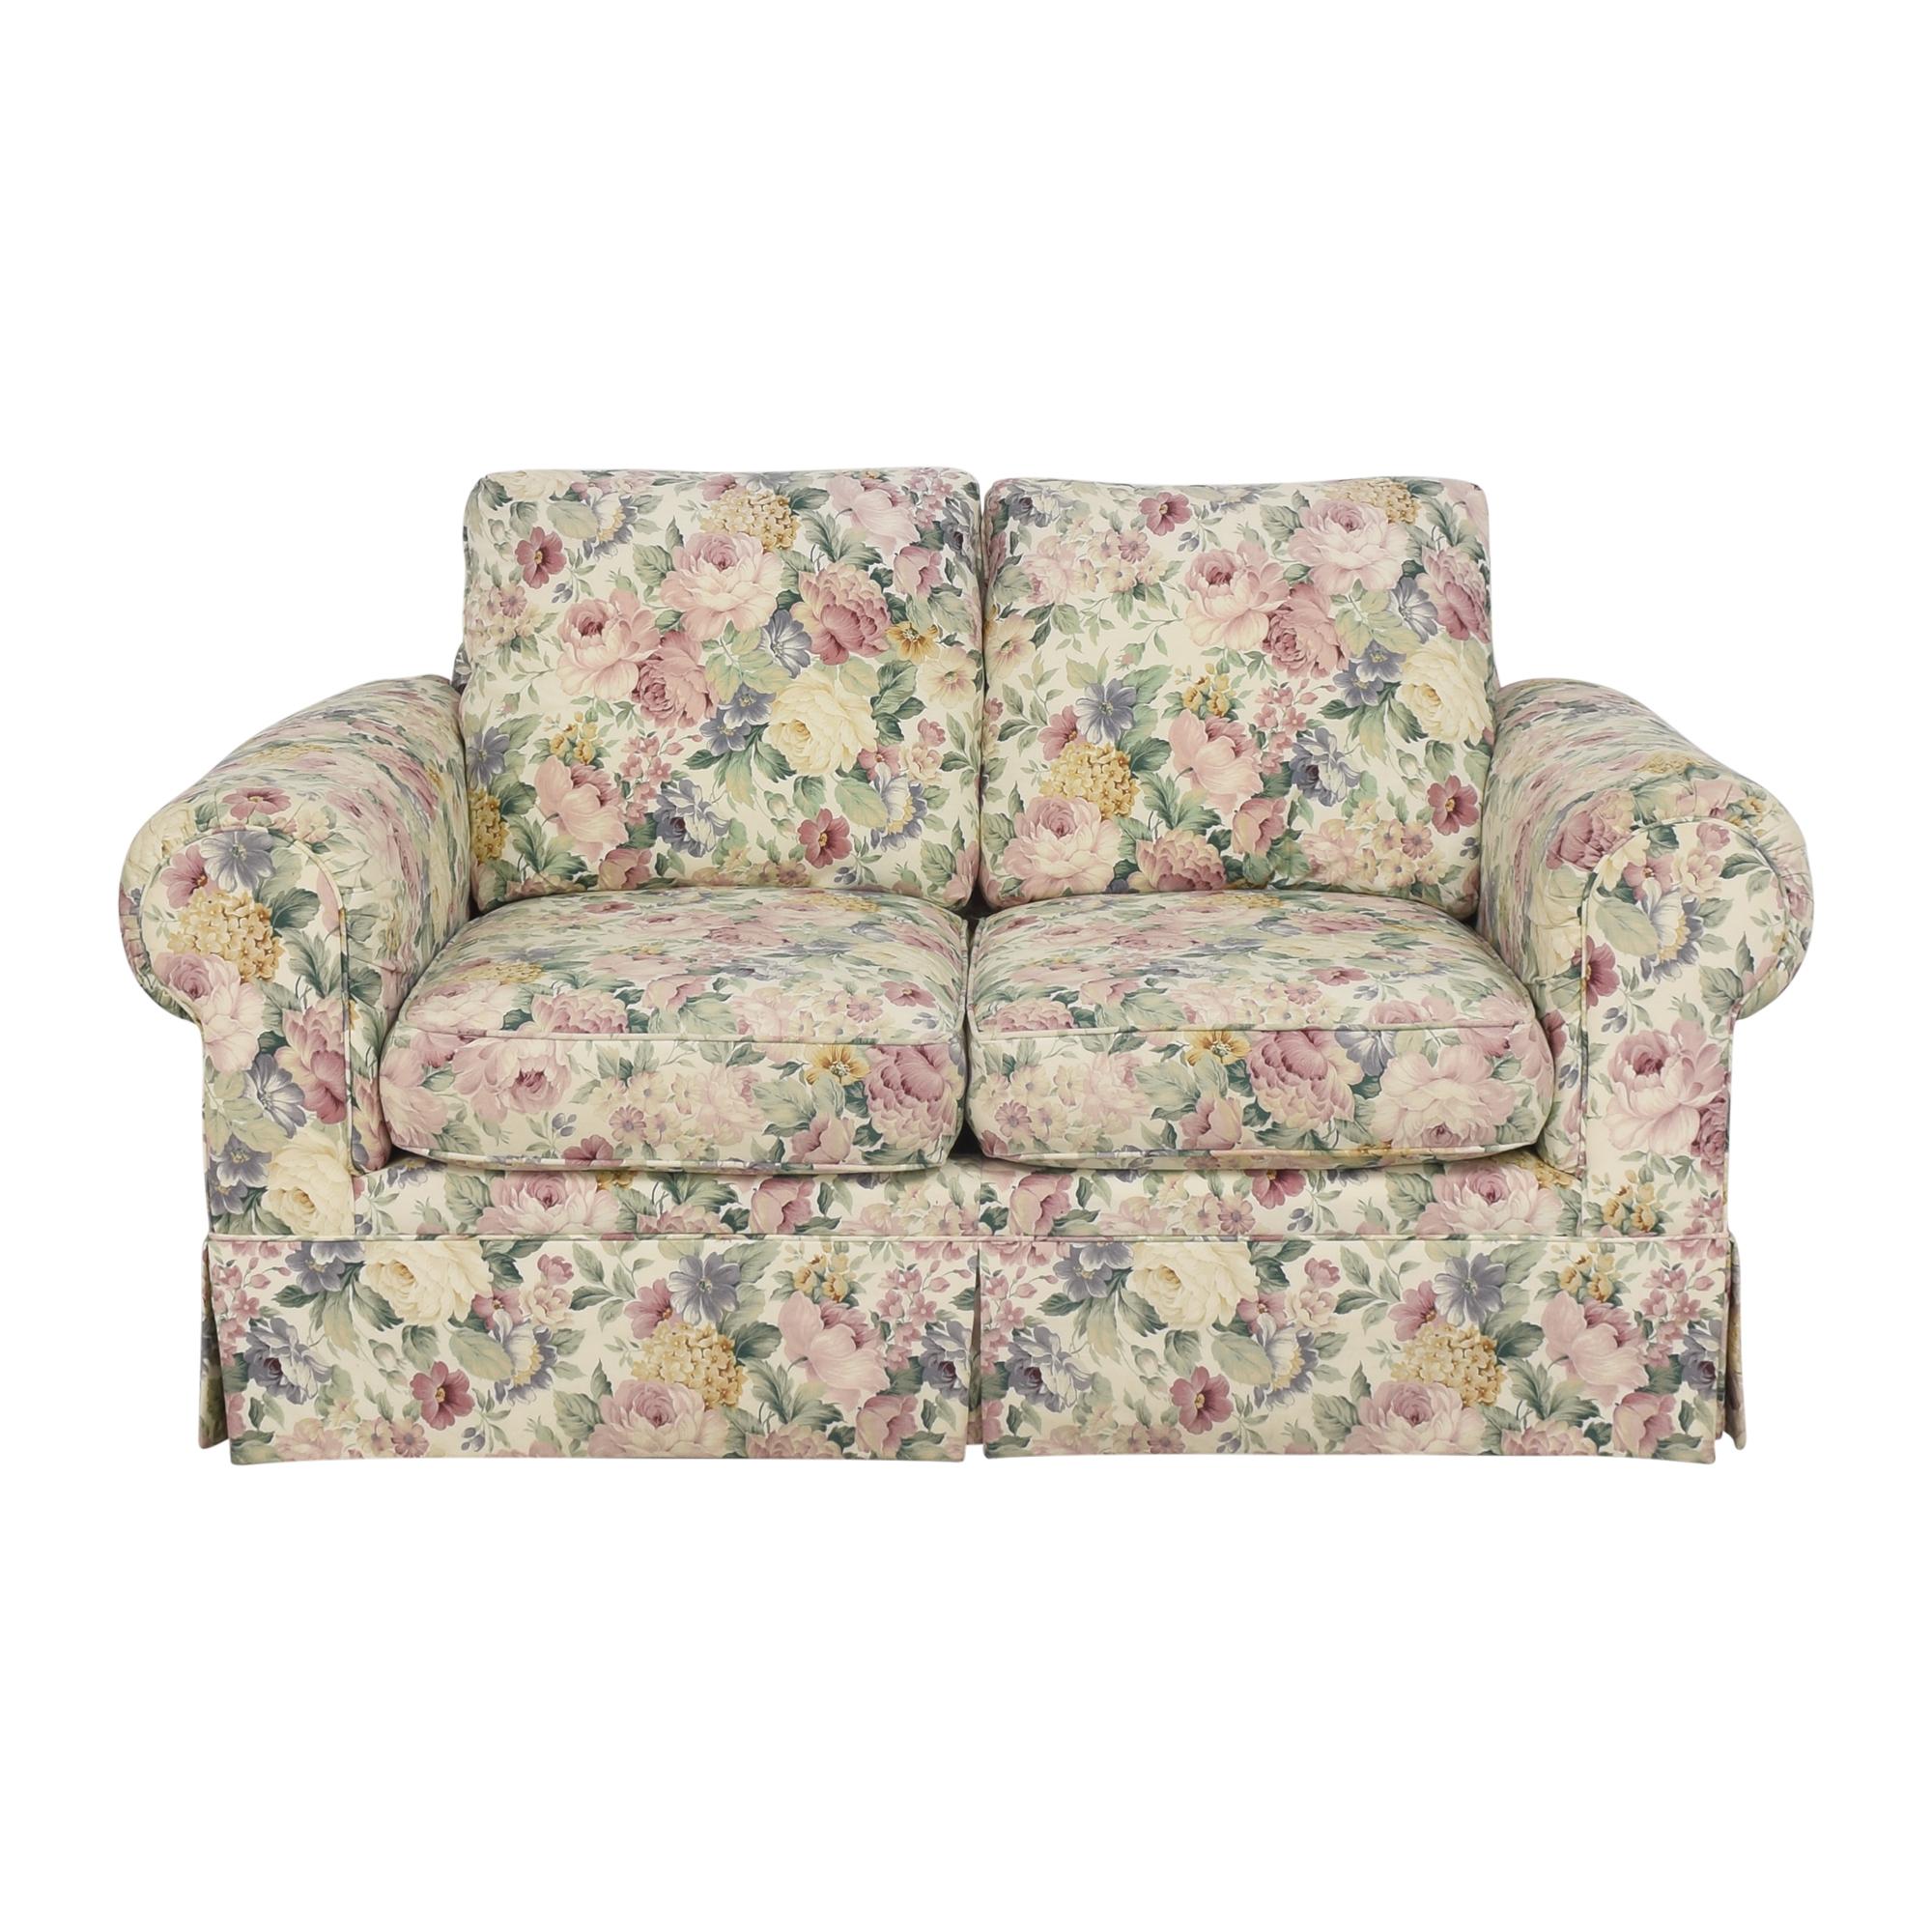 buy Fairmont Manor Fairmont Manor Floral Loveseat online